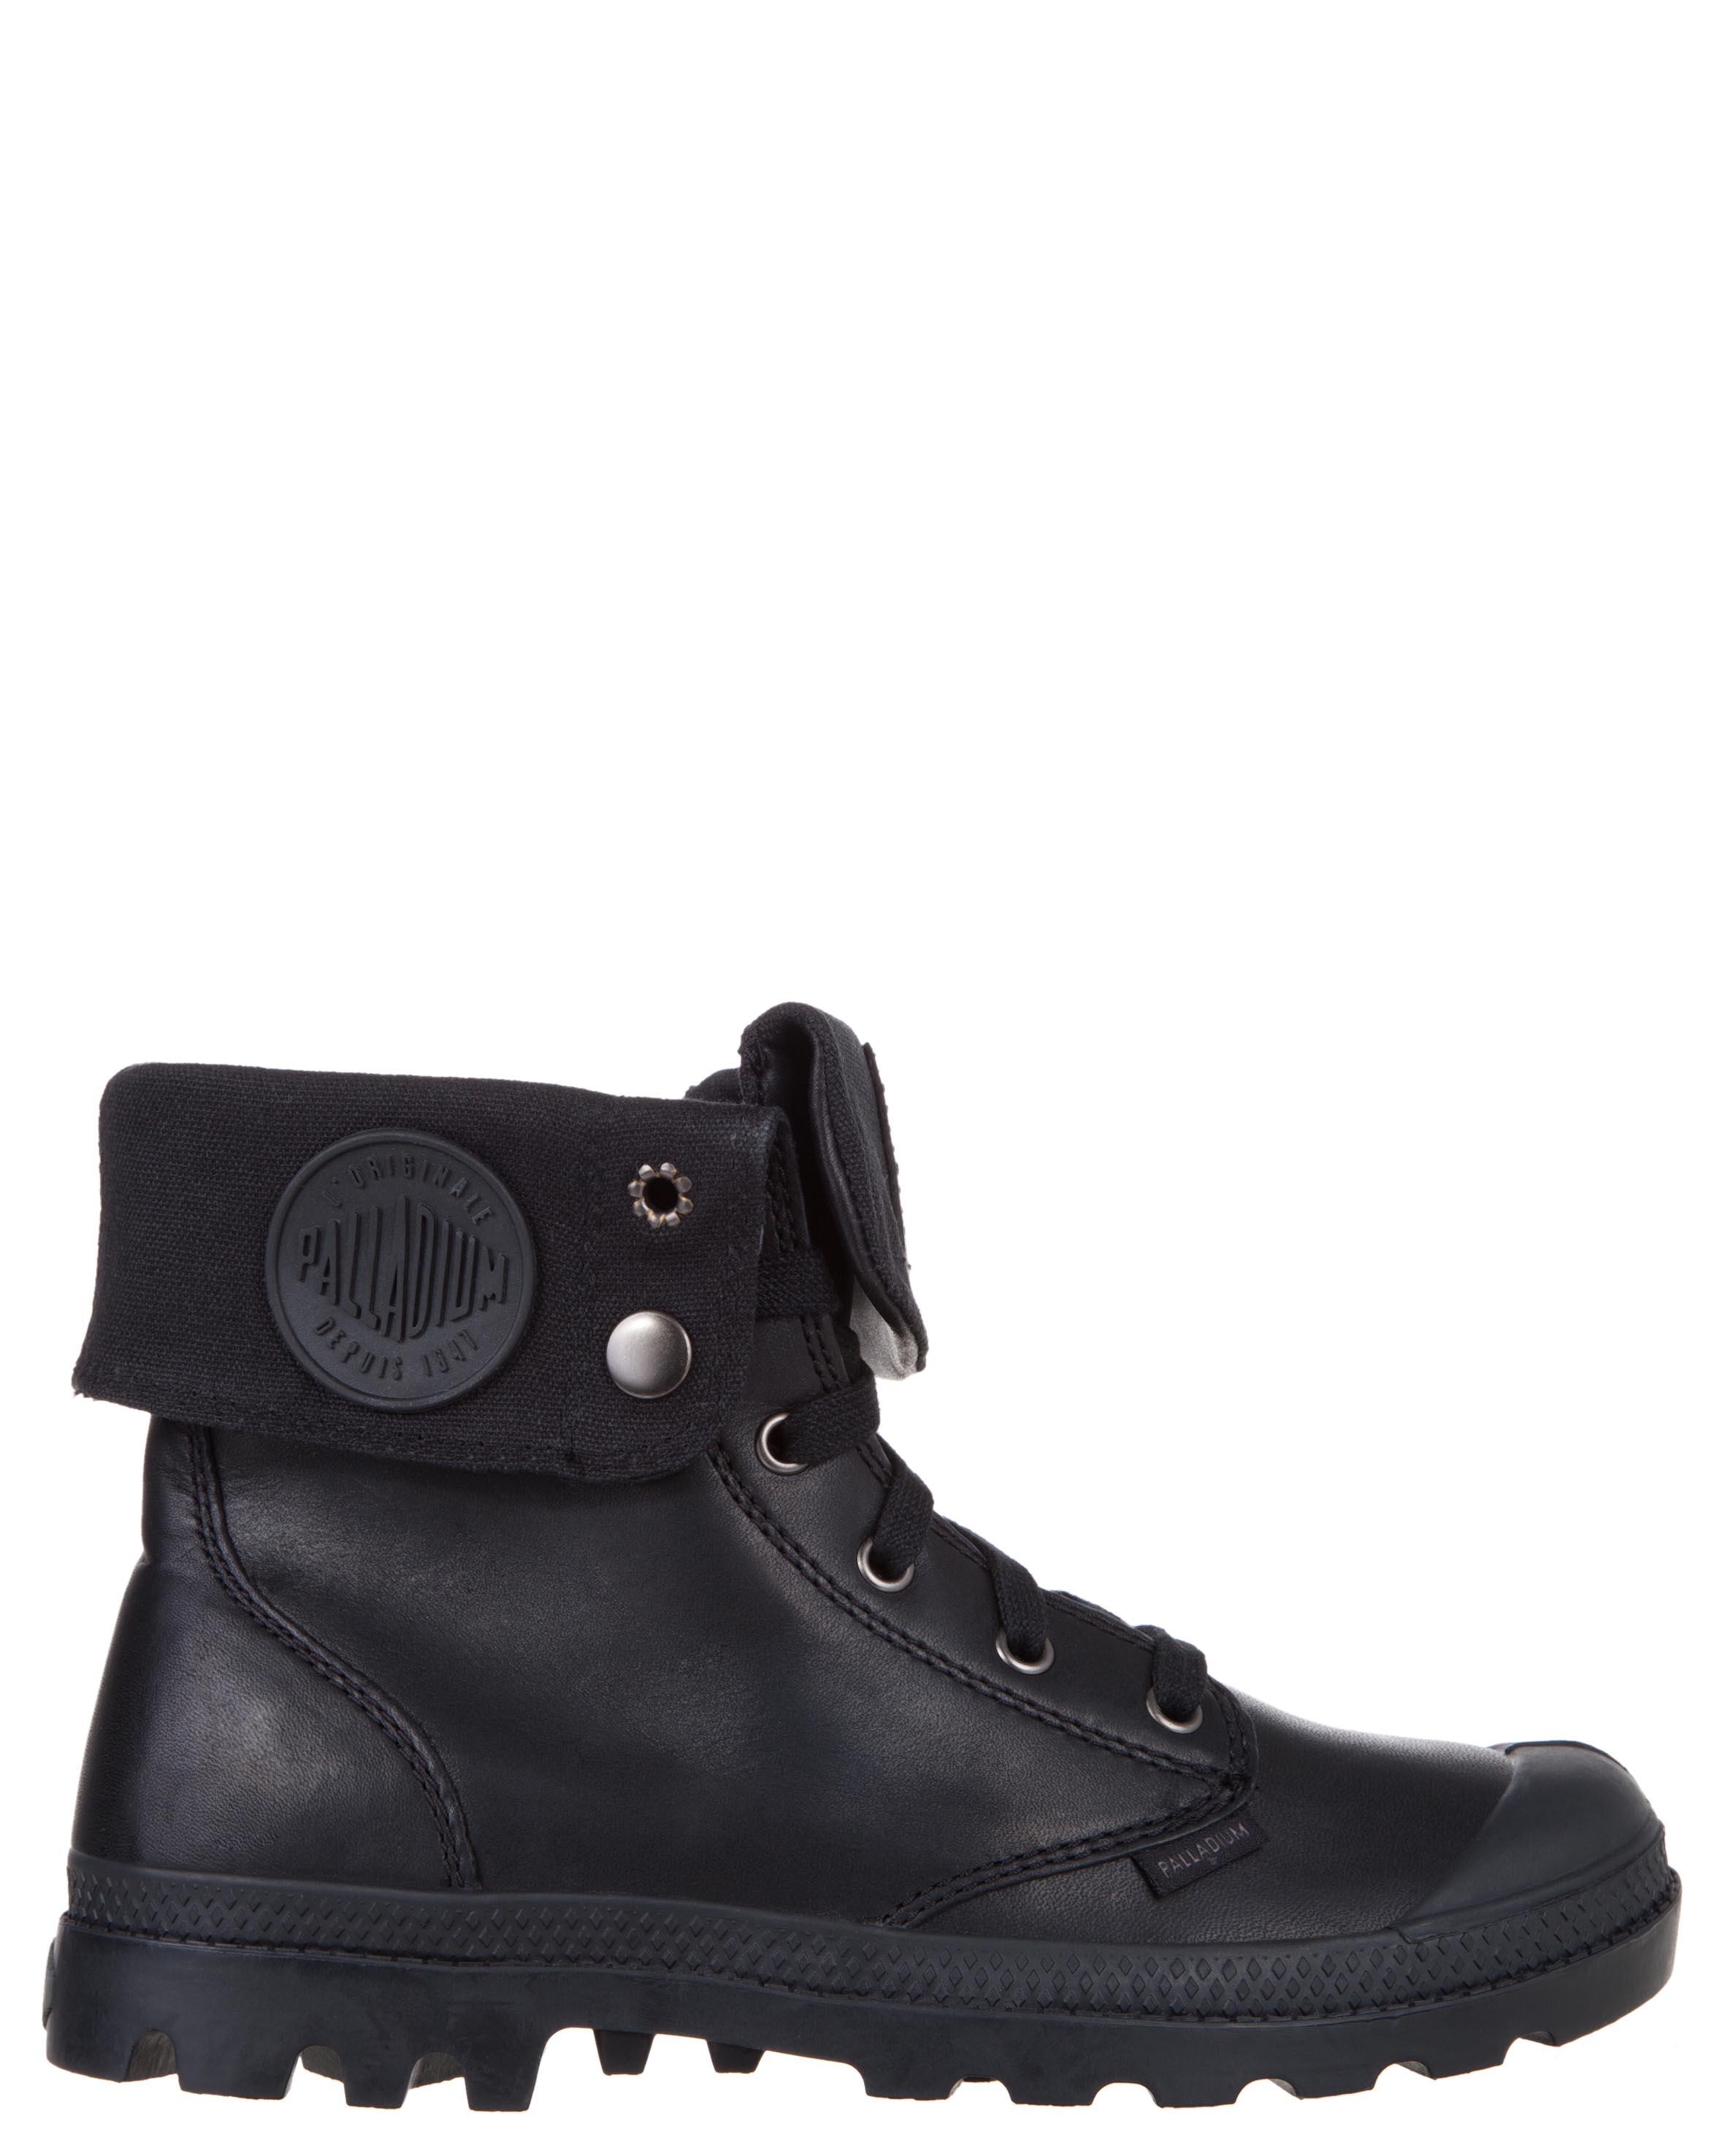 Women shoes online. Buy palladium boots